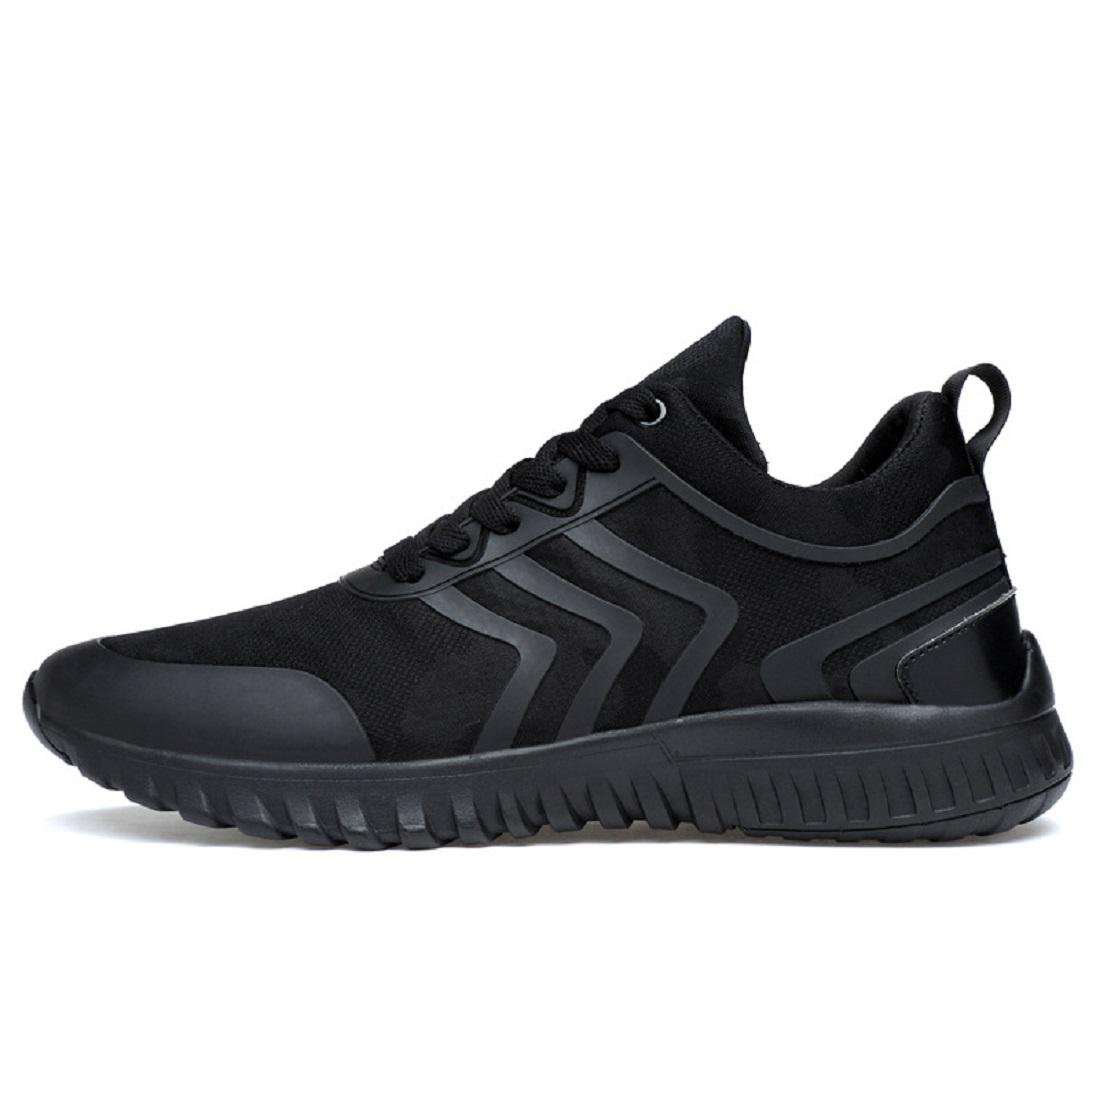 Herren Das neue Sportschuhe Draussen Laufschuhe Flache Schuhe Licht Atmungsaktiv EUR GRÖSSE 38-43